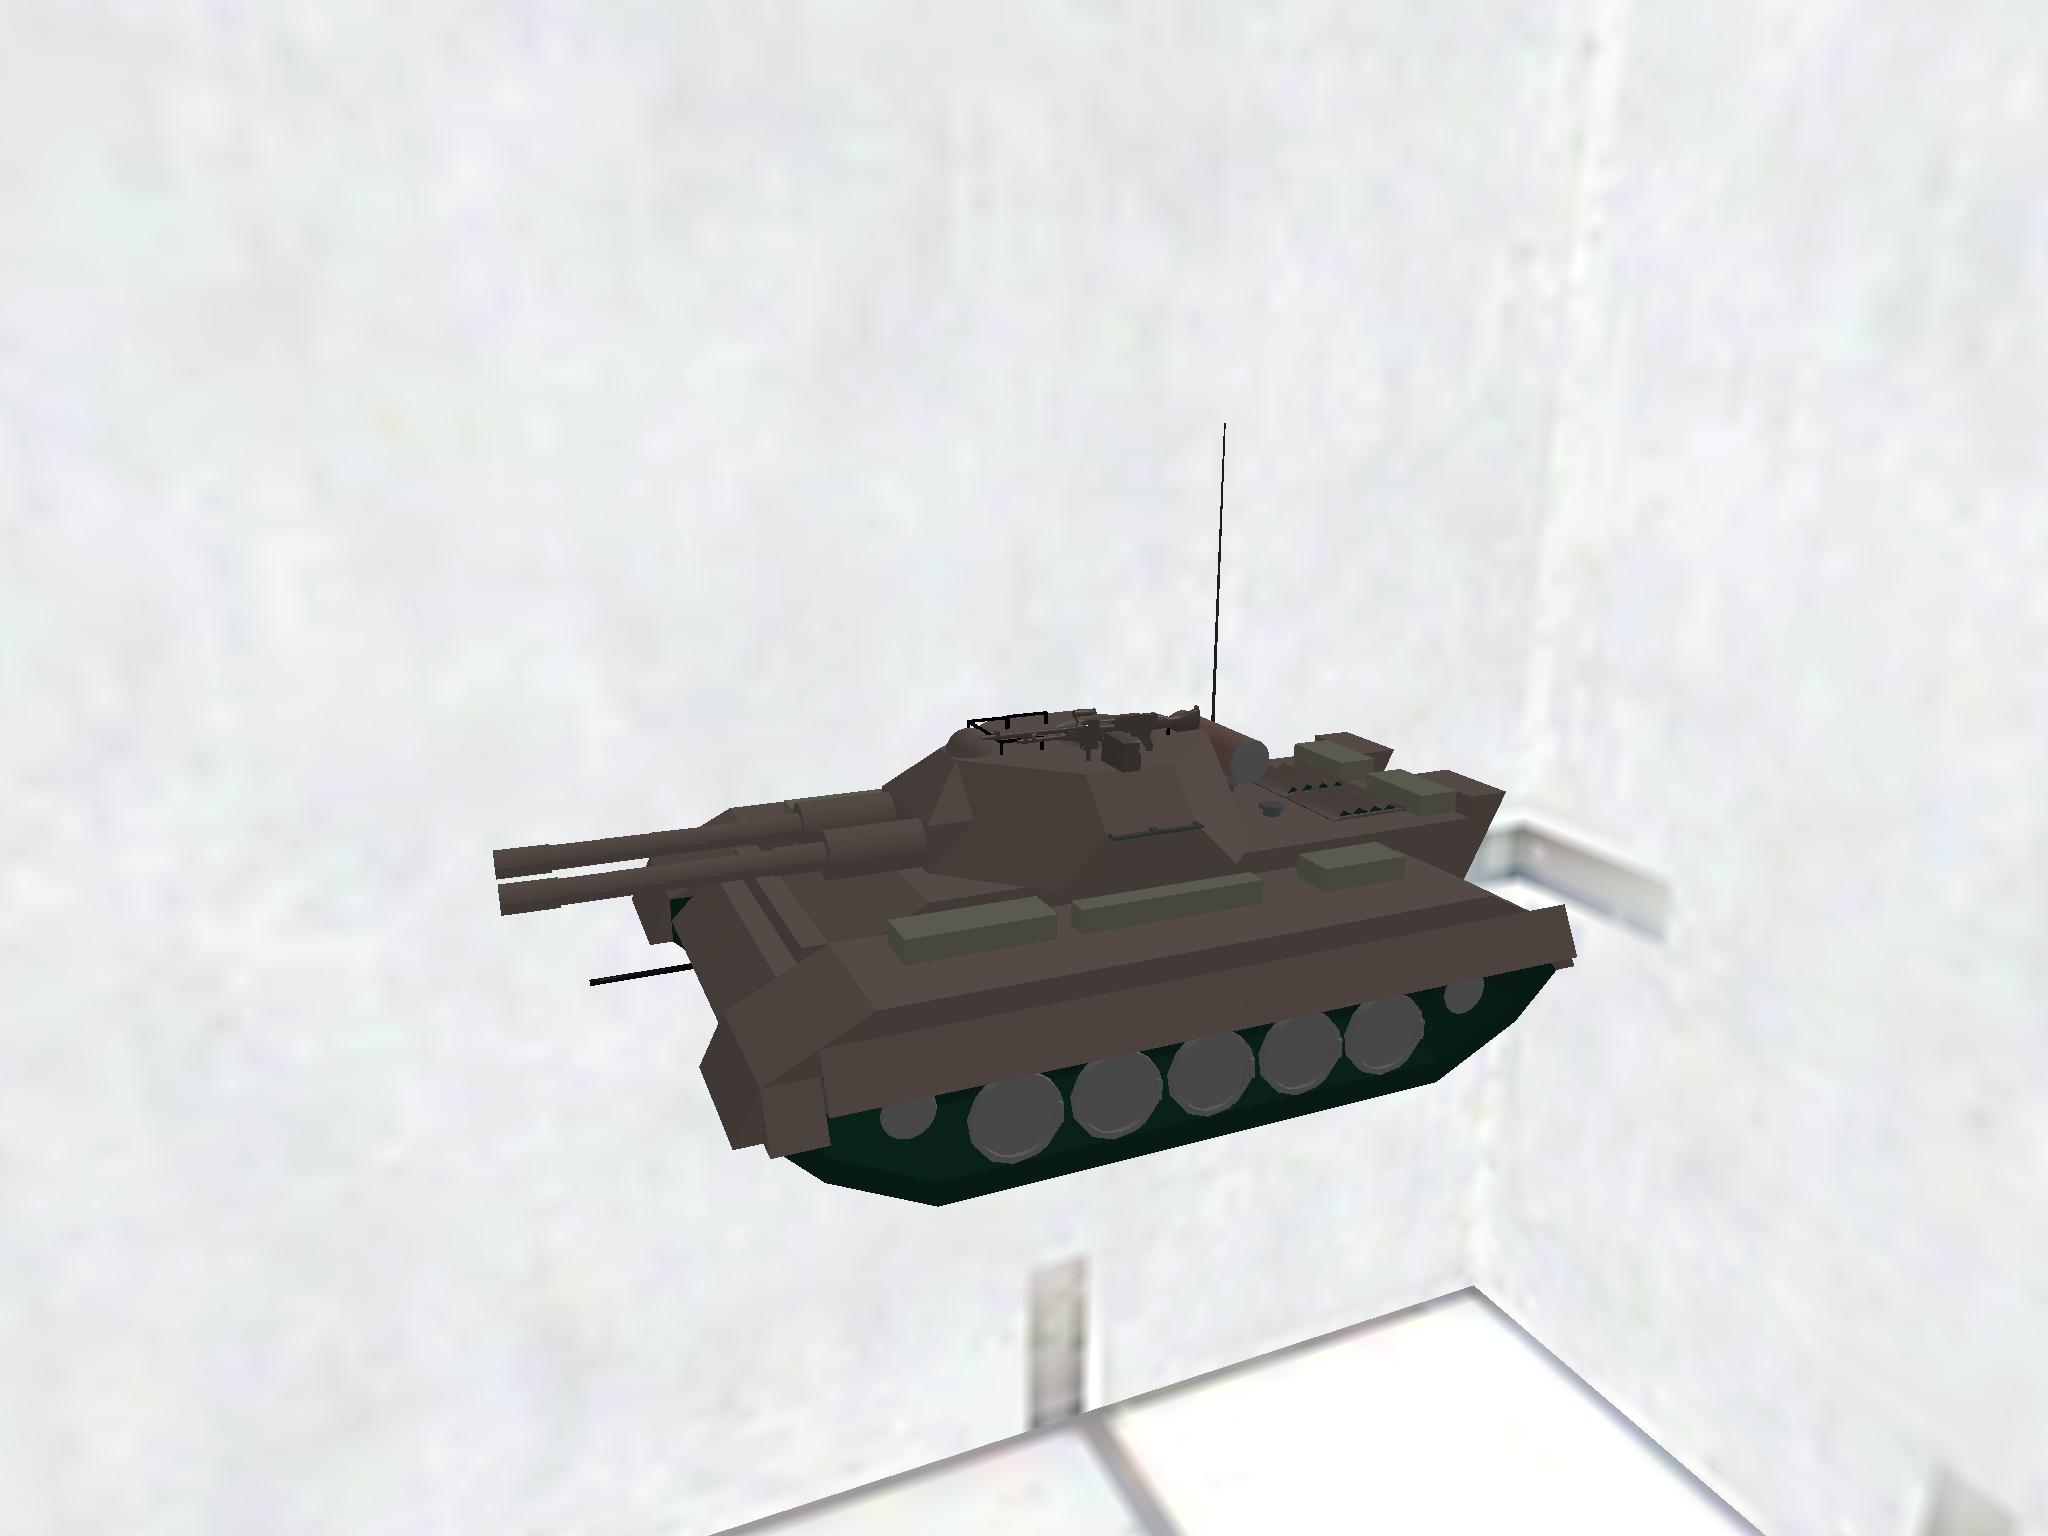 Total Apocalypse tank